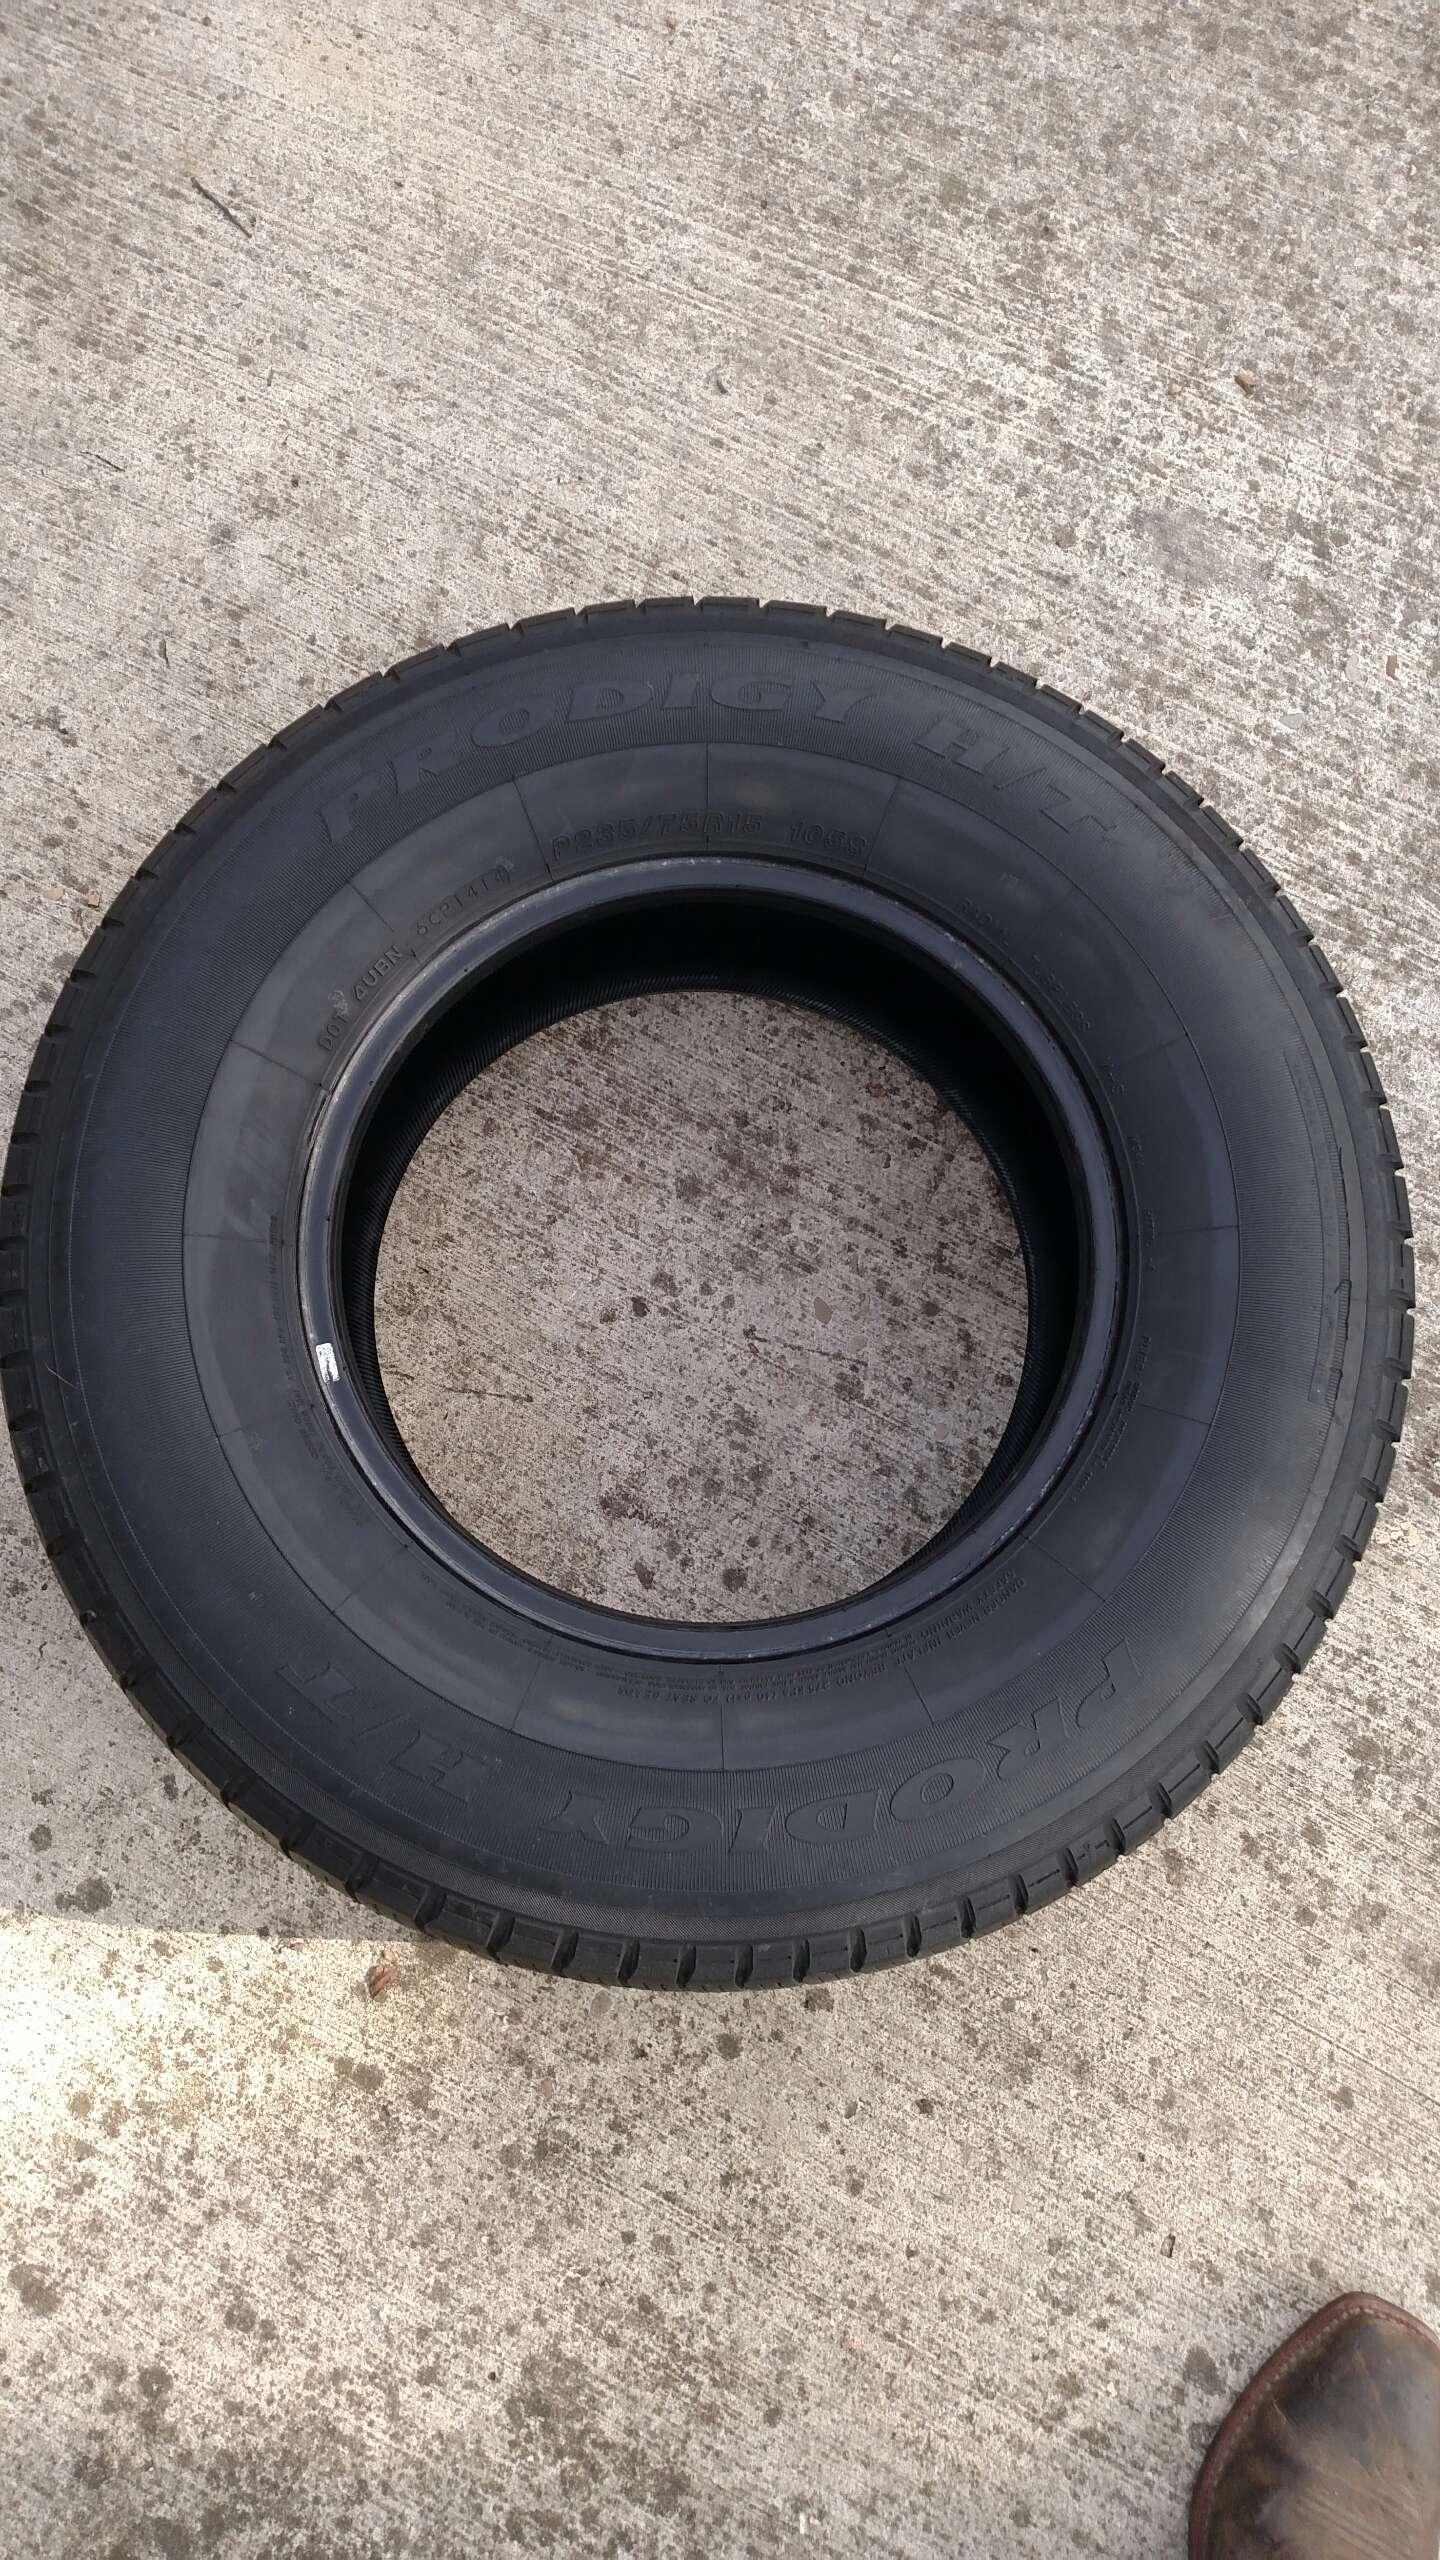 Prodigy H T P235 75r15 Tire For Sale In San Antonio Tx